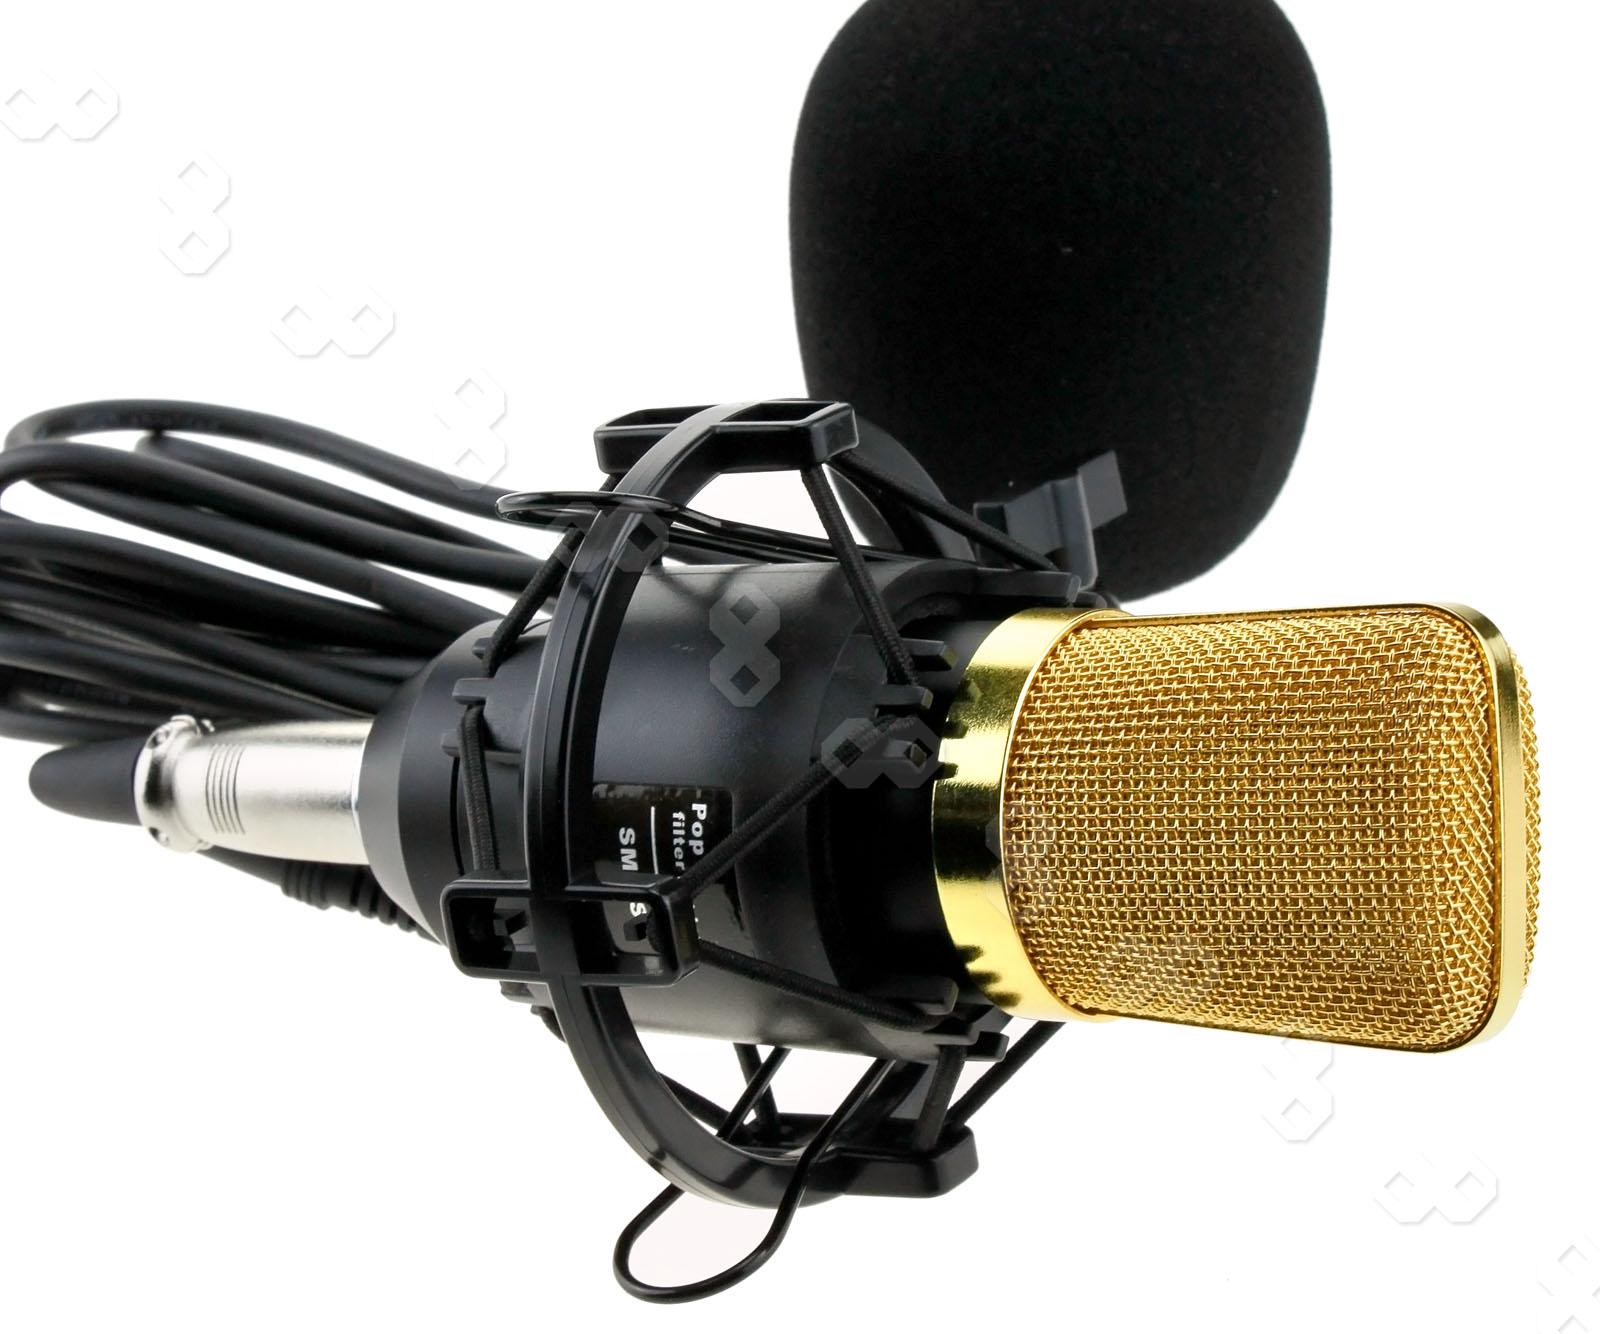 microphone sound studio condenser dynamic mic large diaphragm cardioid w mount ebay. Black Bedroom Furniture Sets. Home Design Ideas